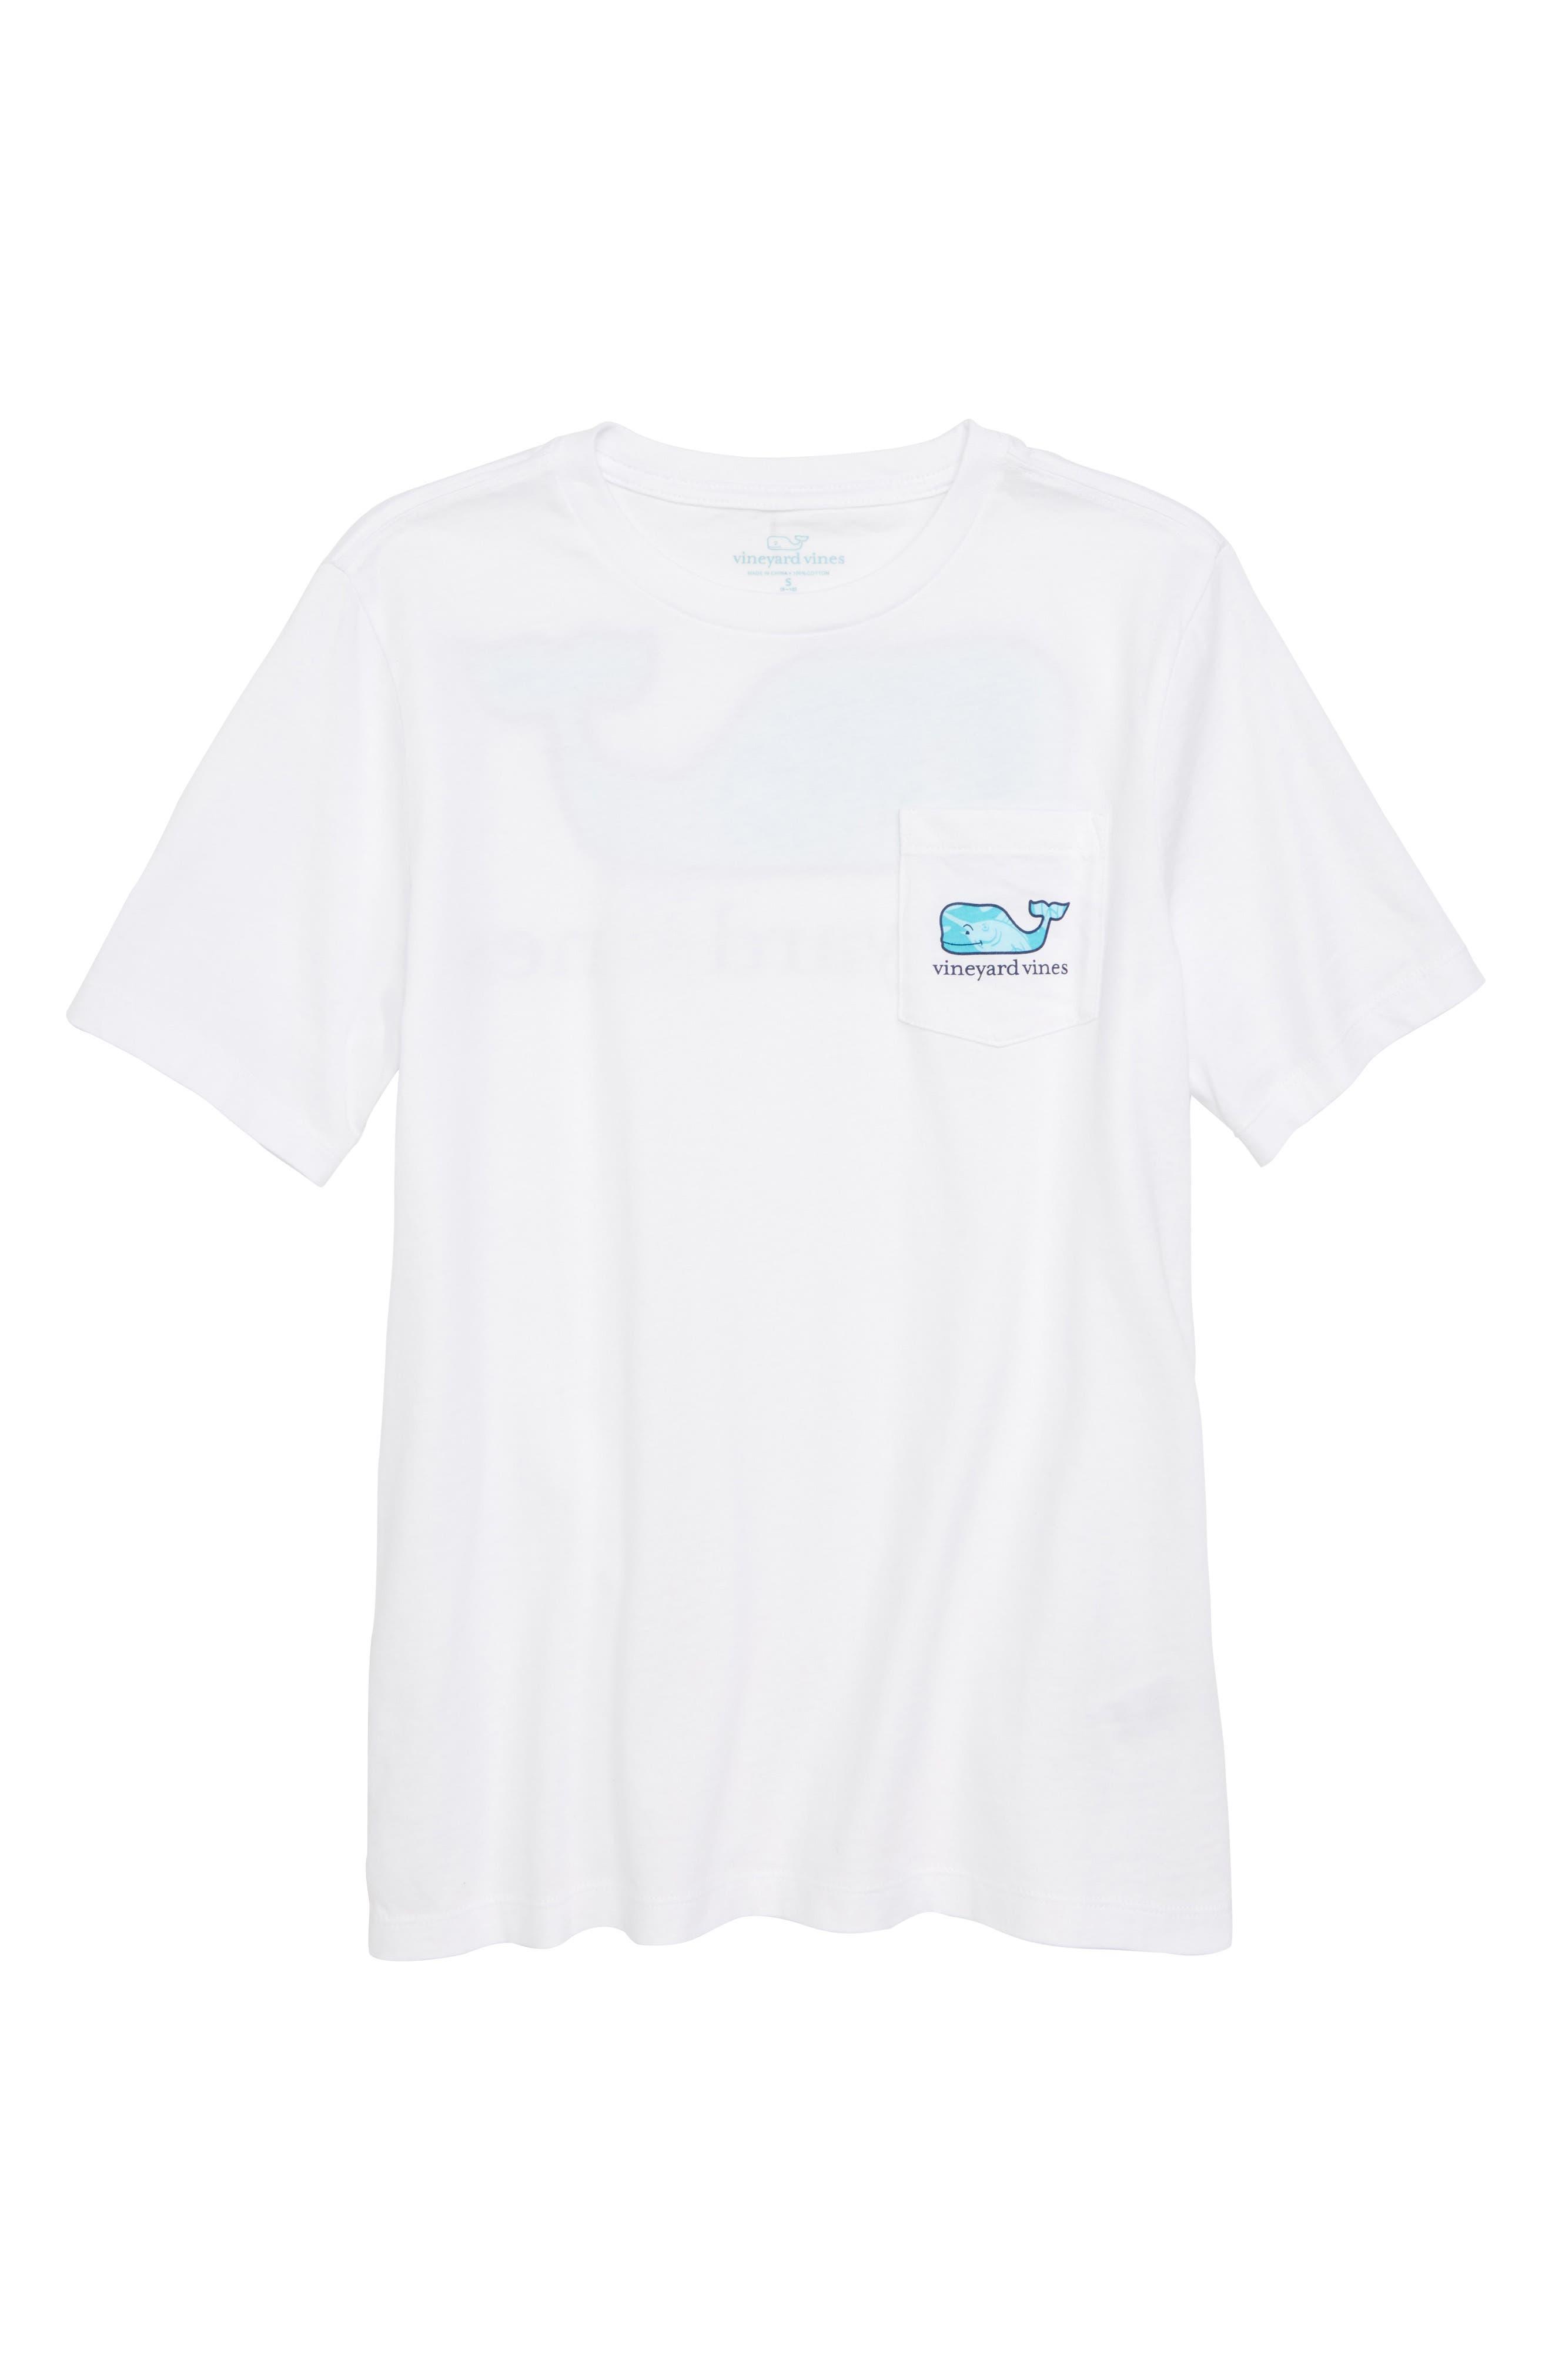 Marlin Whale Graphic T-Shirt,                         Main,                         color, White Cap